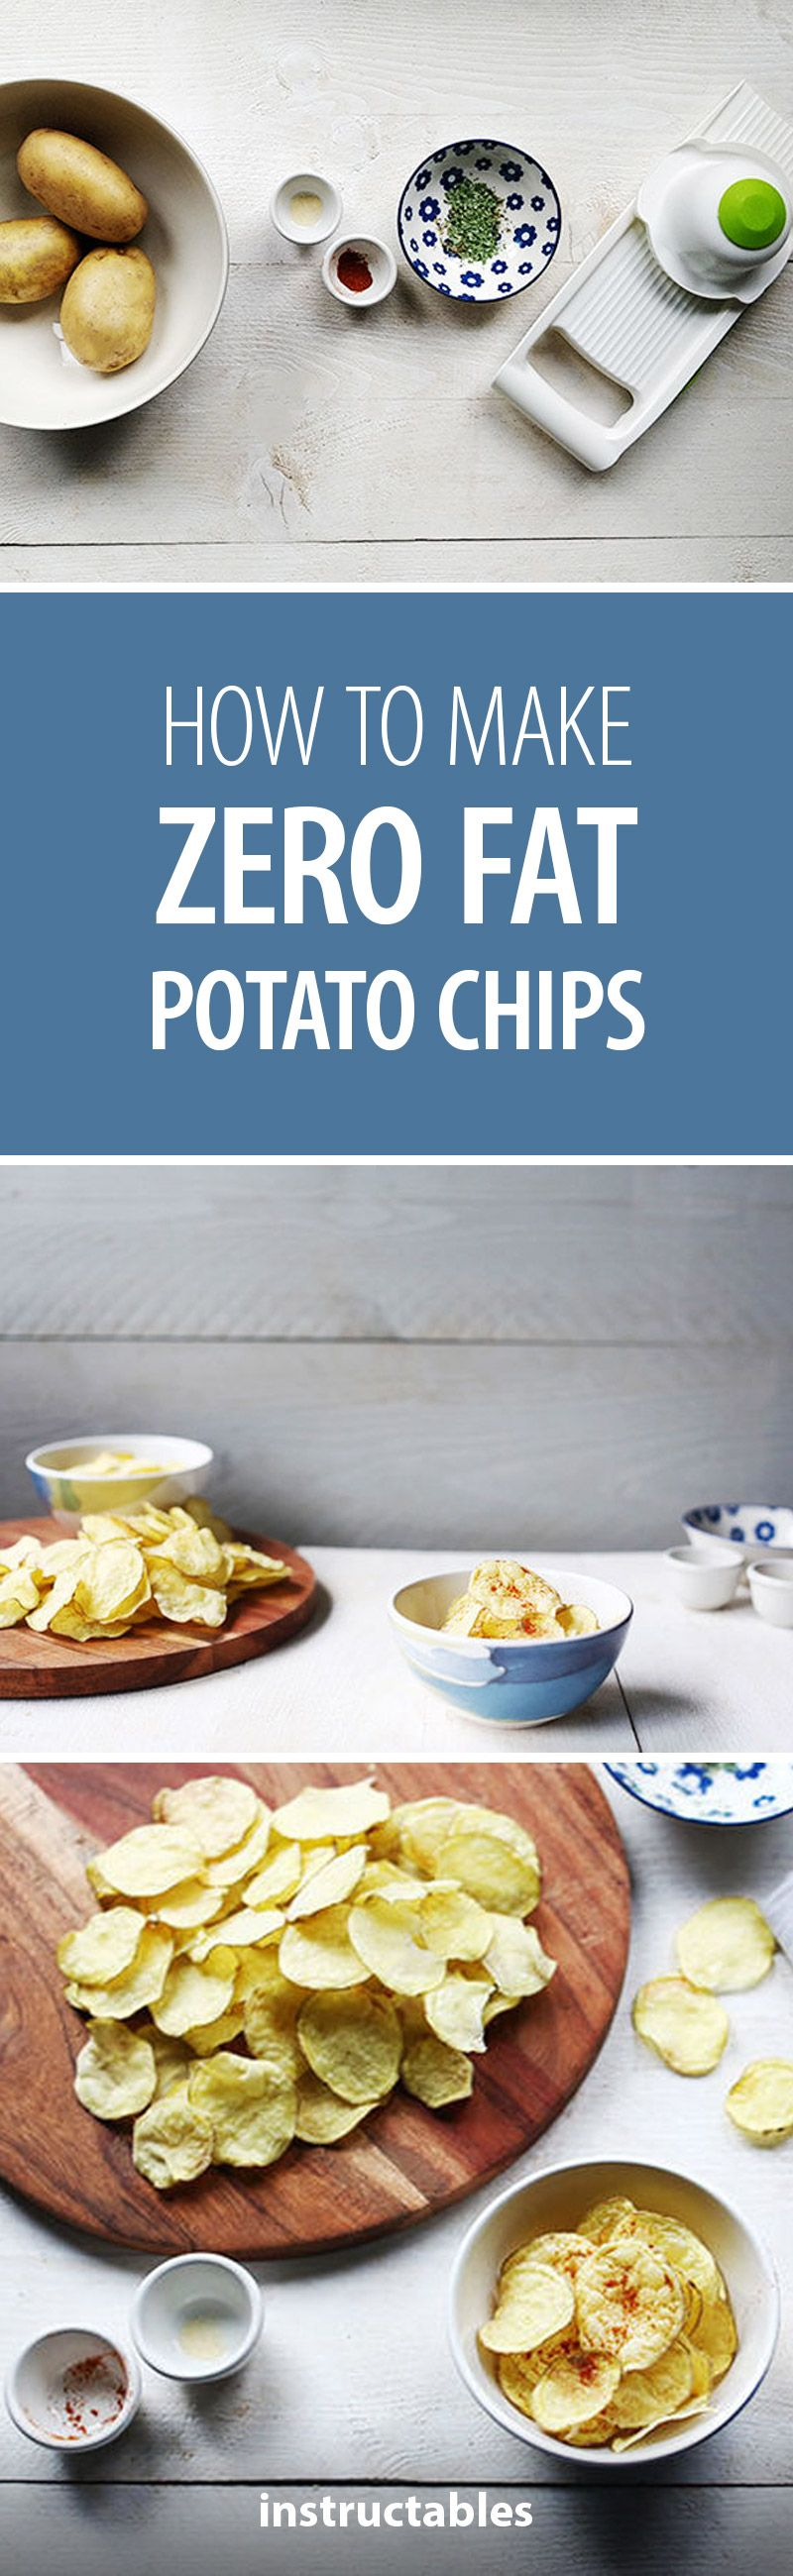 how to make potato crisps